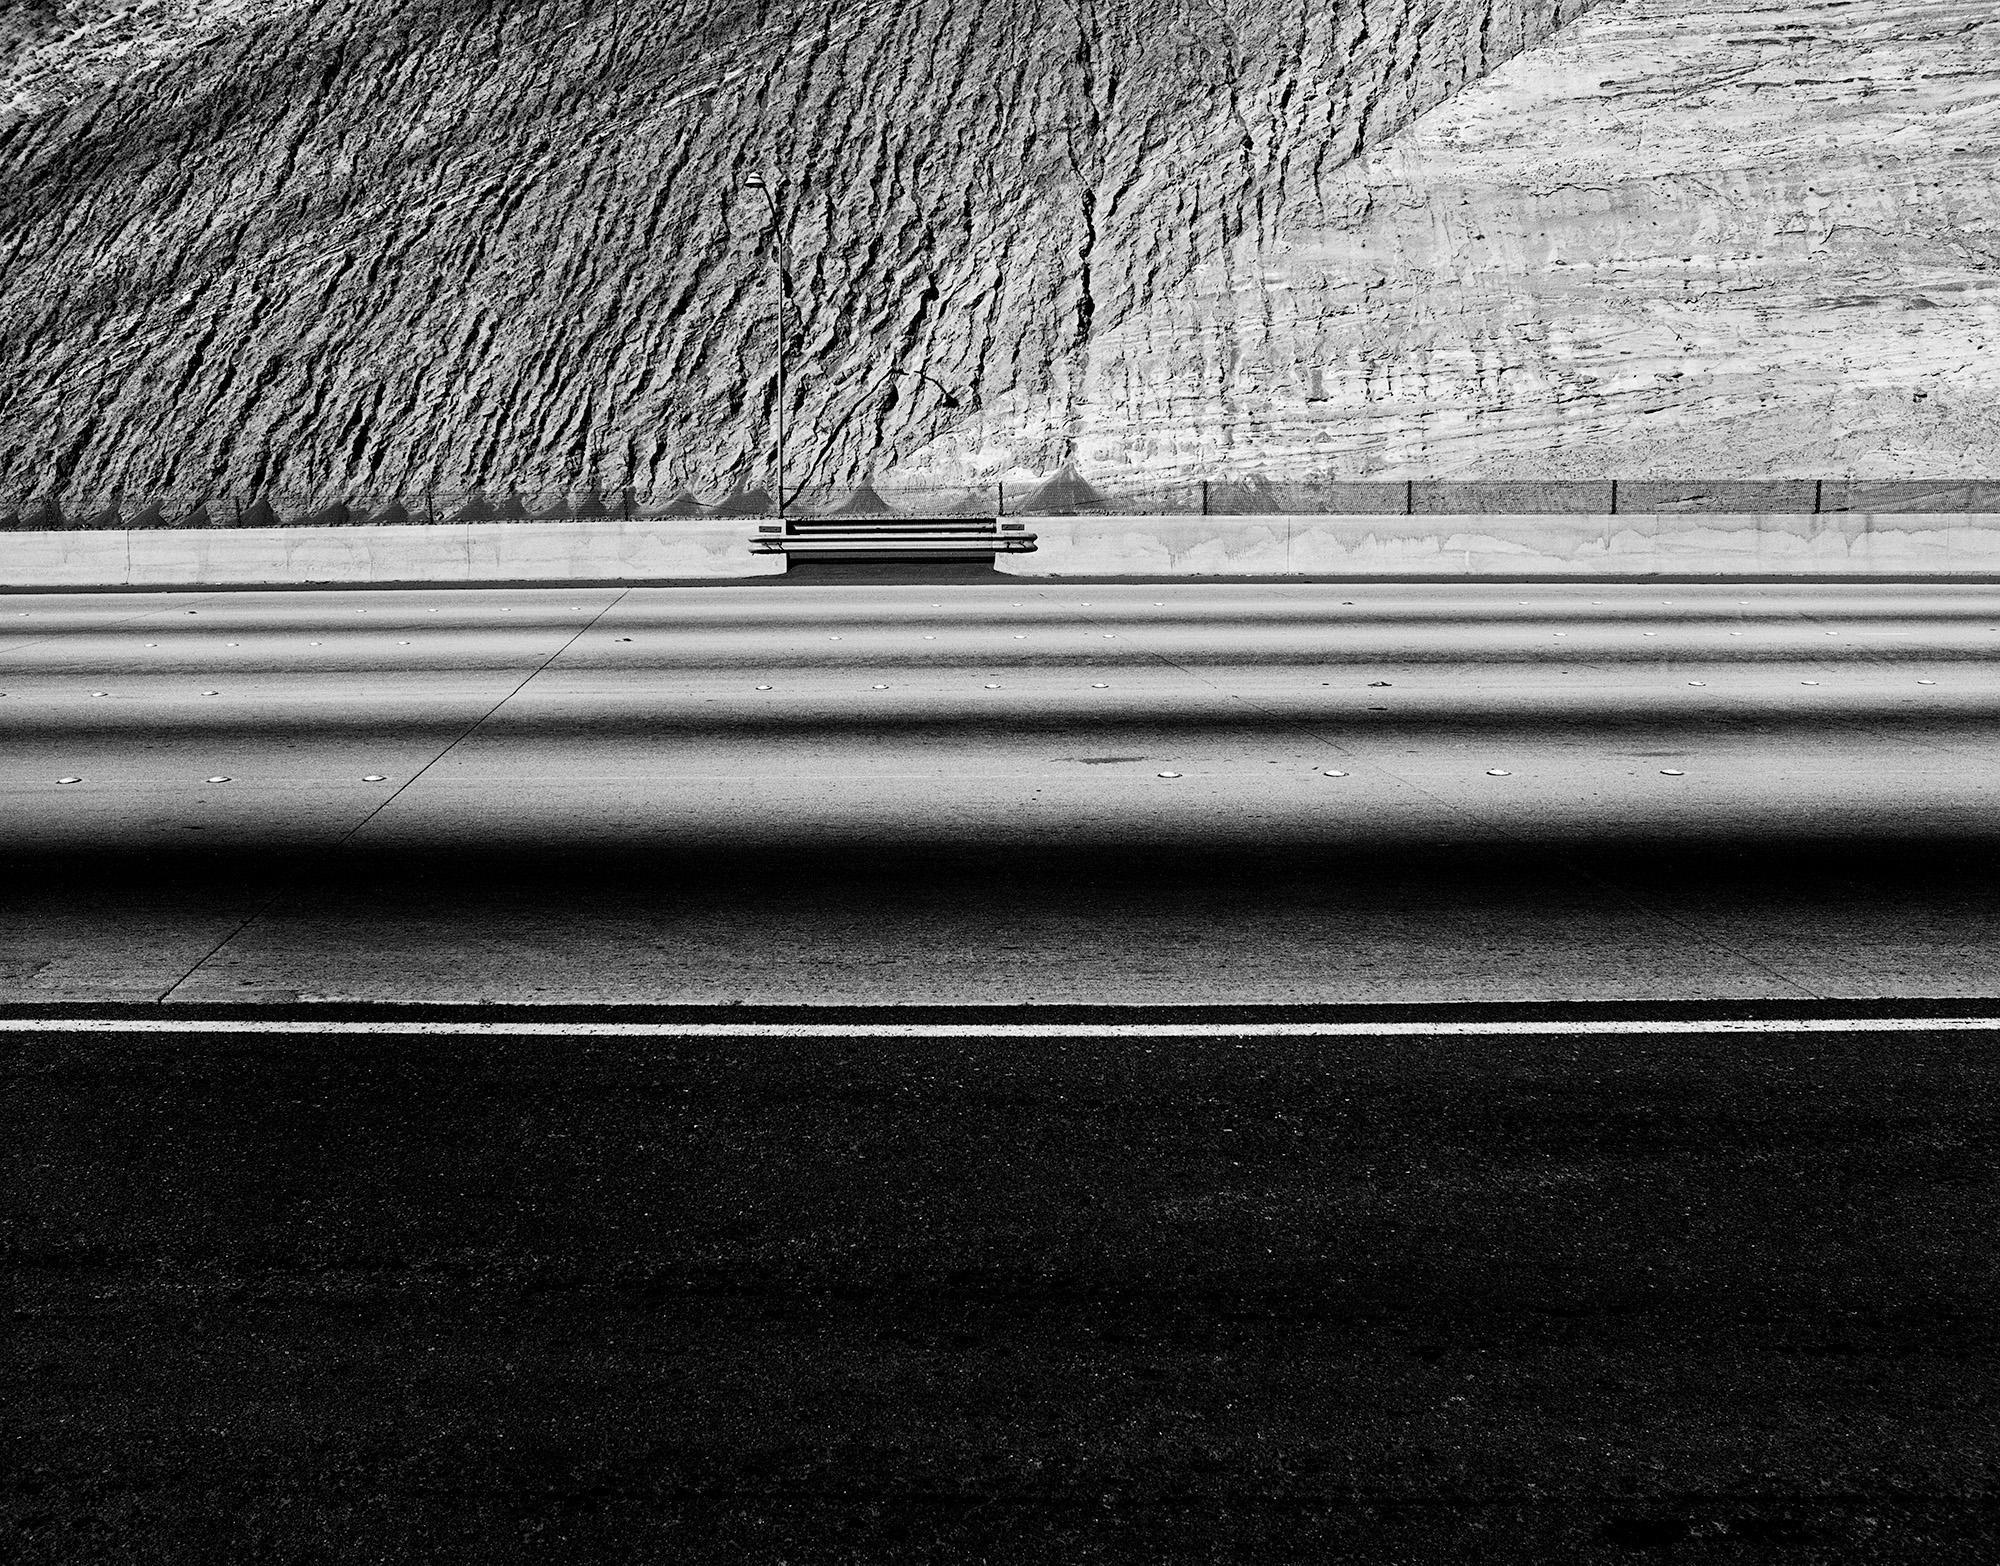 Interstate 14, California, USA, 1978